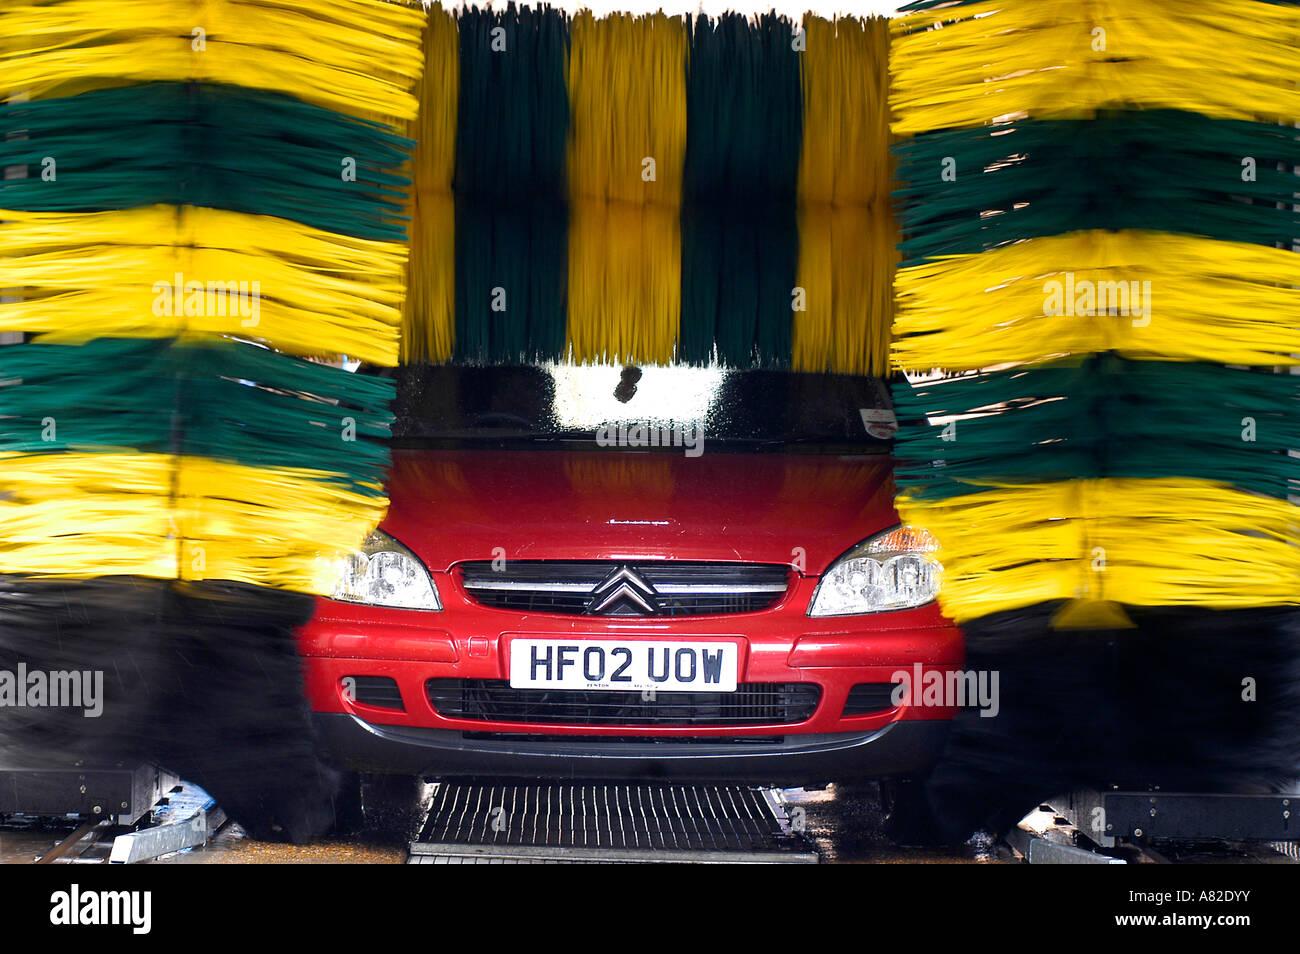 Citroen C5 driving through a car wash - Stock Image